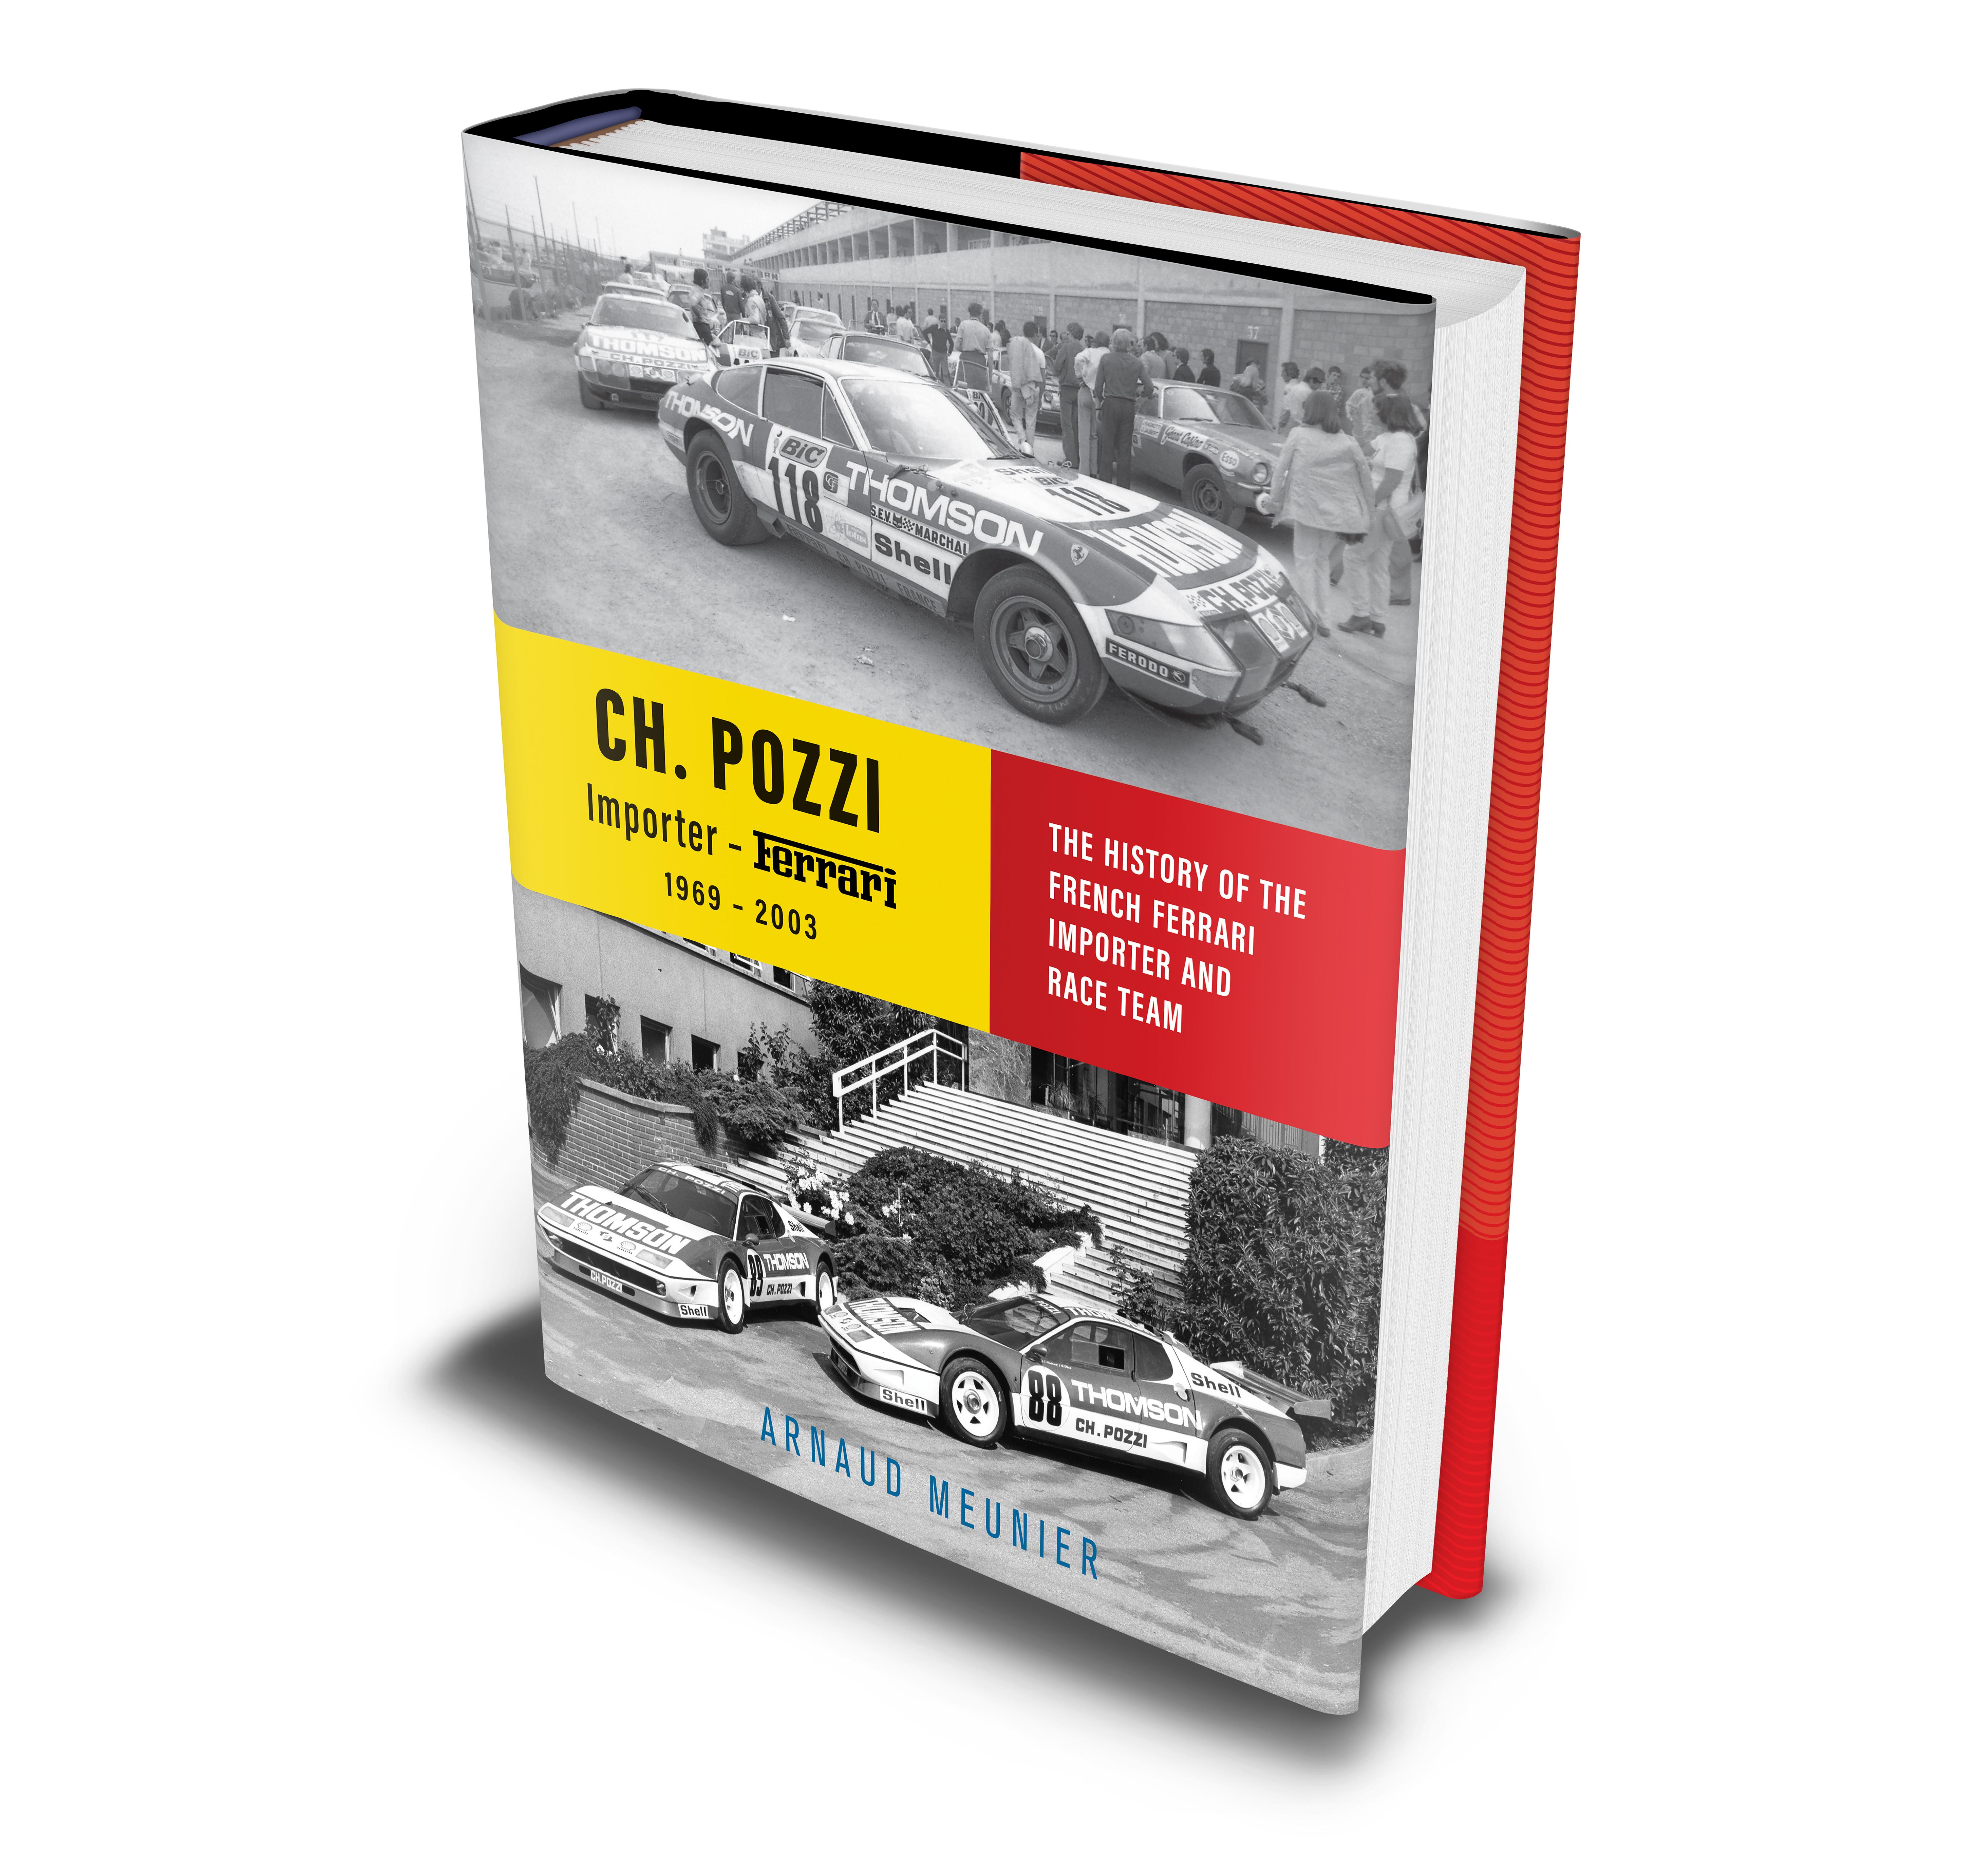 Charles Pozzi - Published early Feb 2021